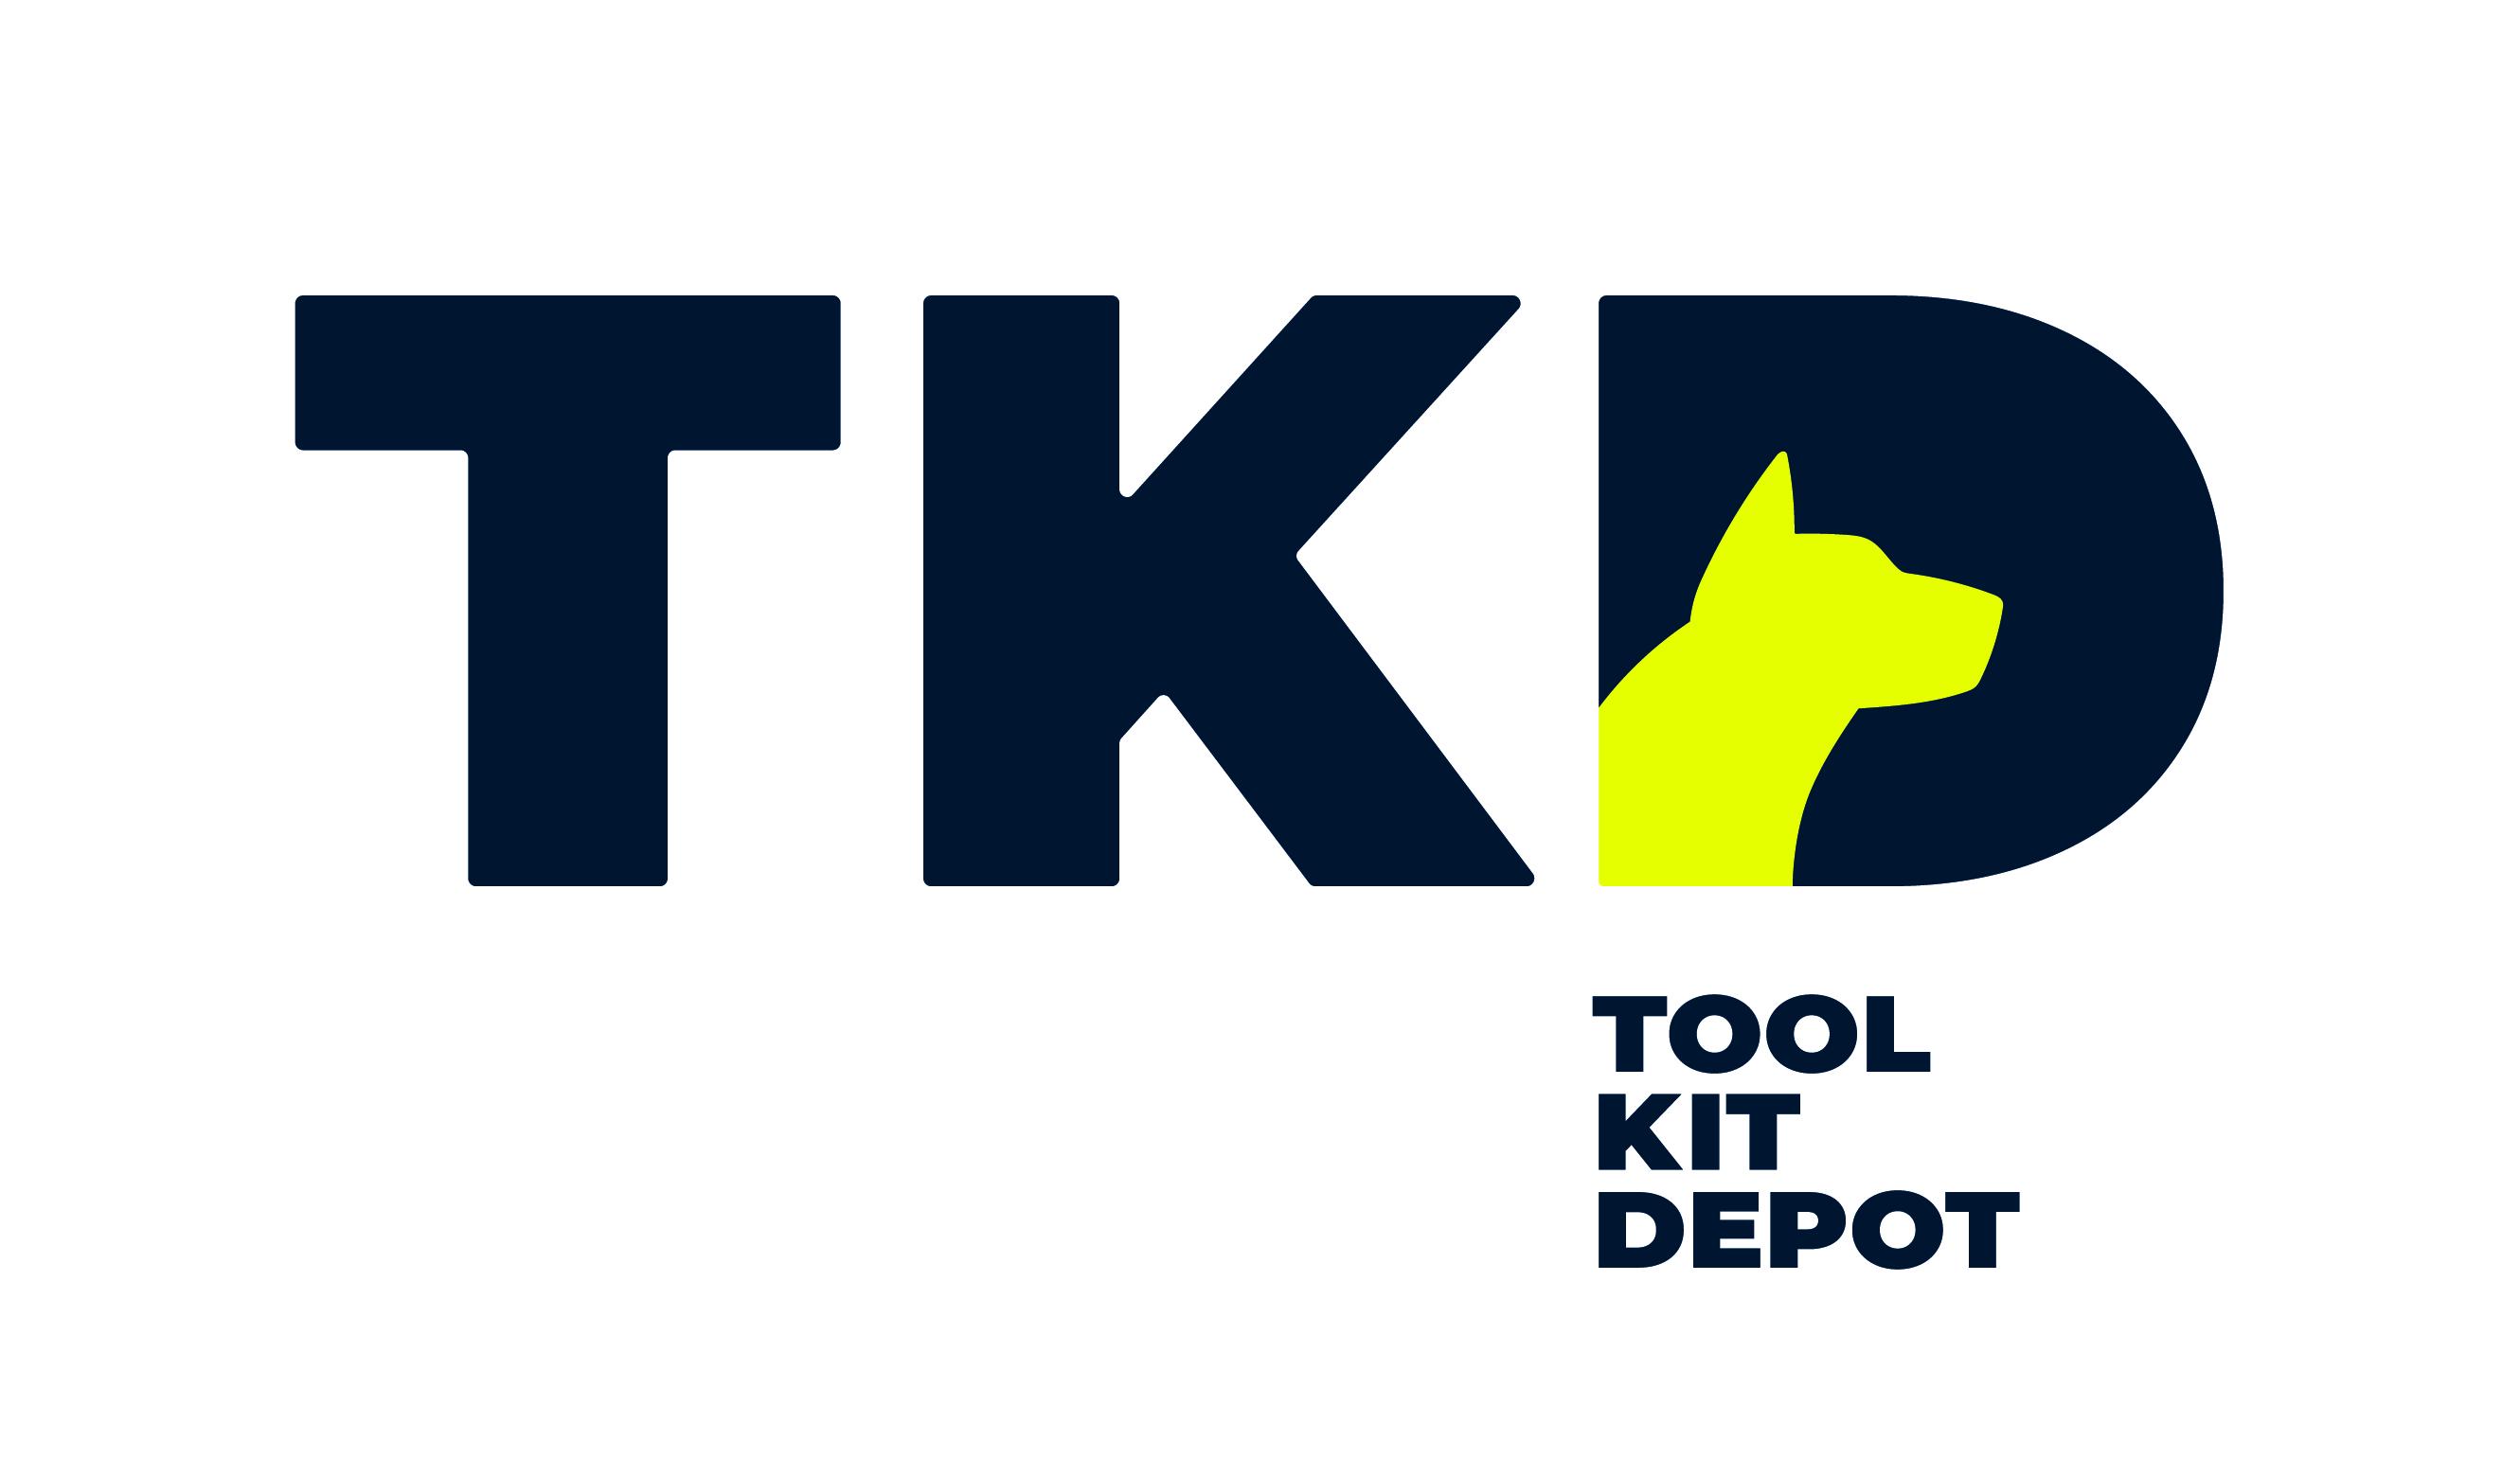 Tool Kit Depot